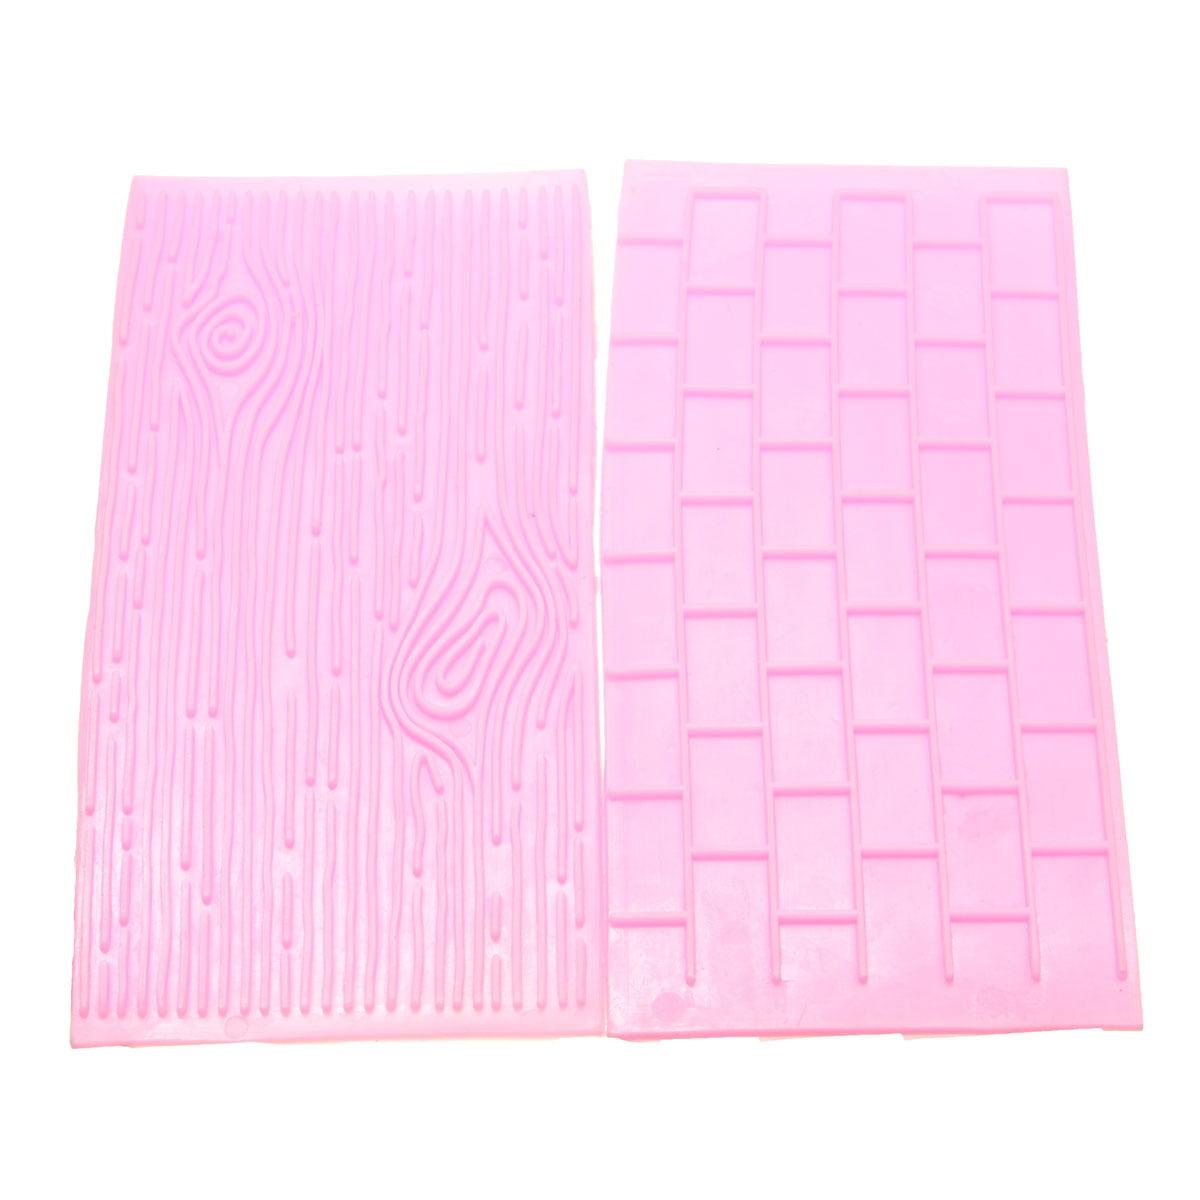 2PCS Fondant Mold Stone Brick Wall Lace Pattern Embossing Cake Decoration Deco Mould (Random Color),A Brick & Wood grain color